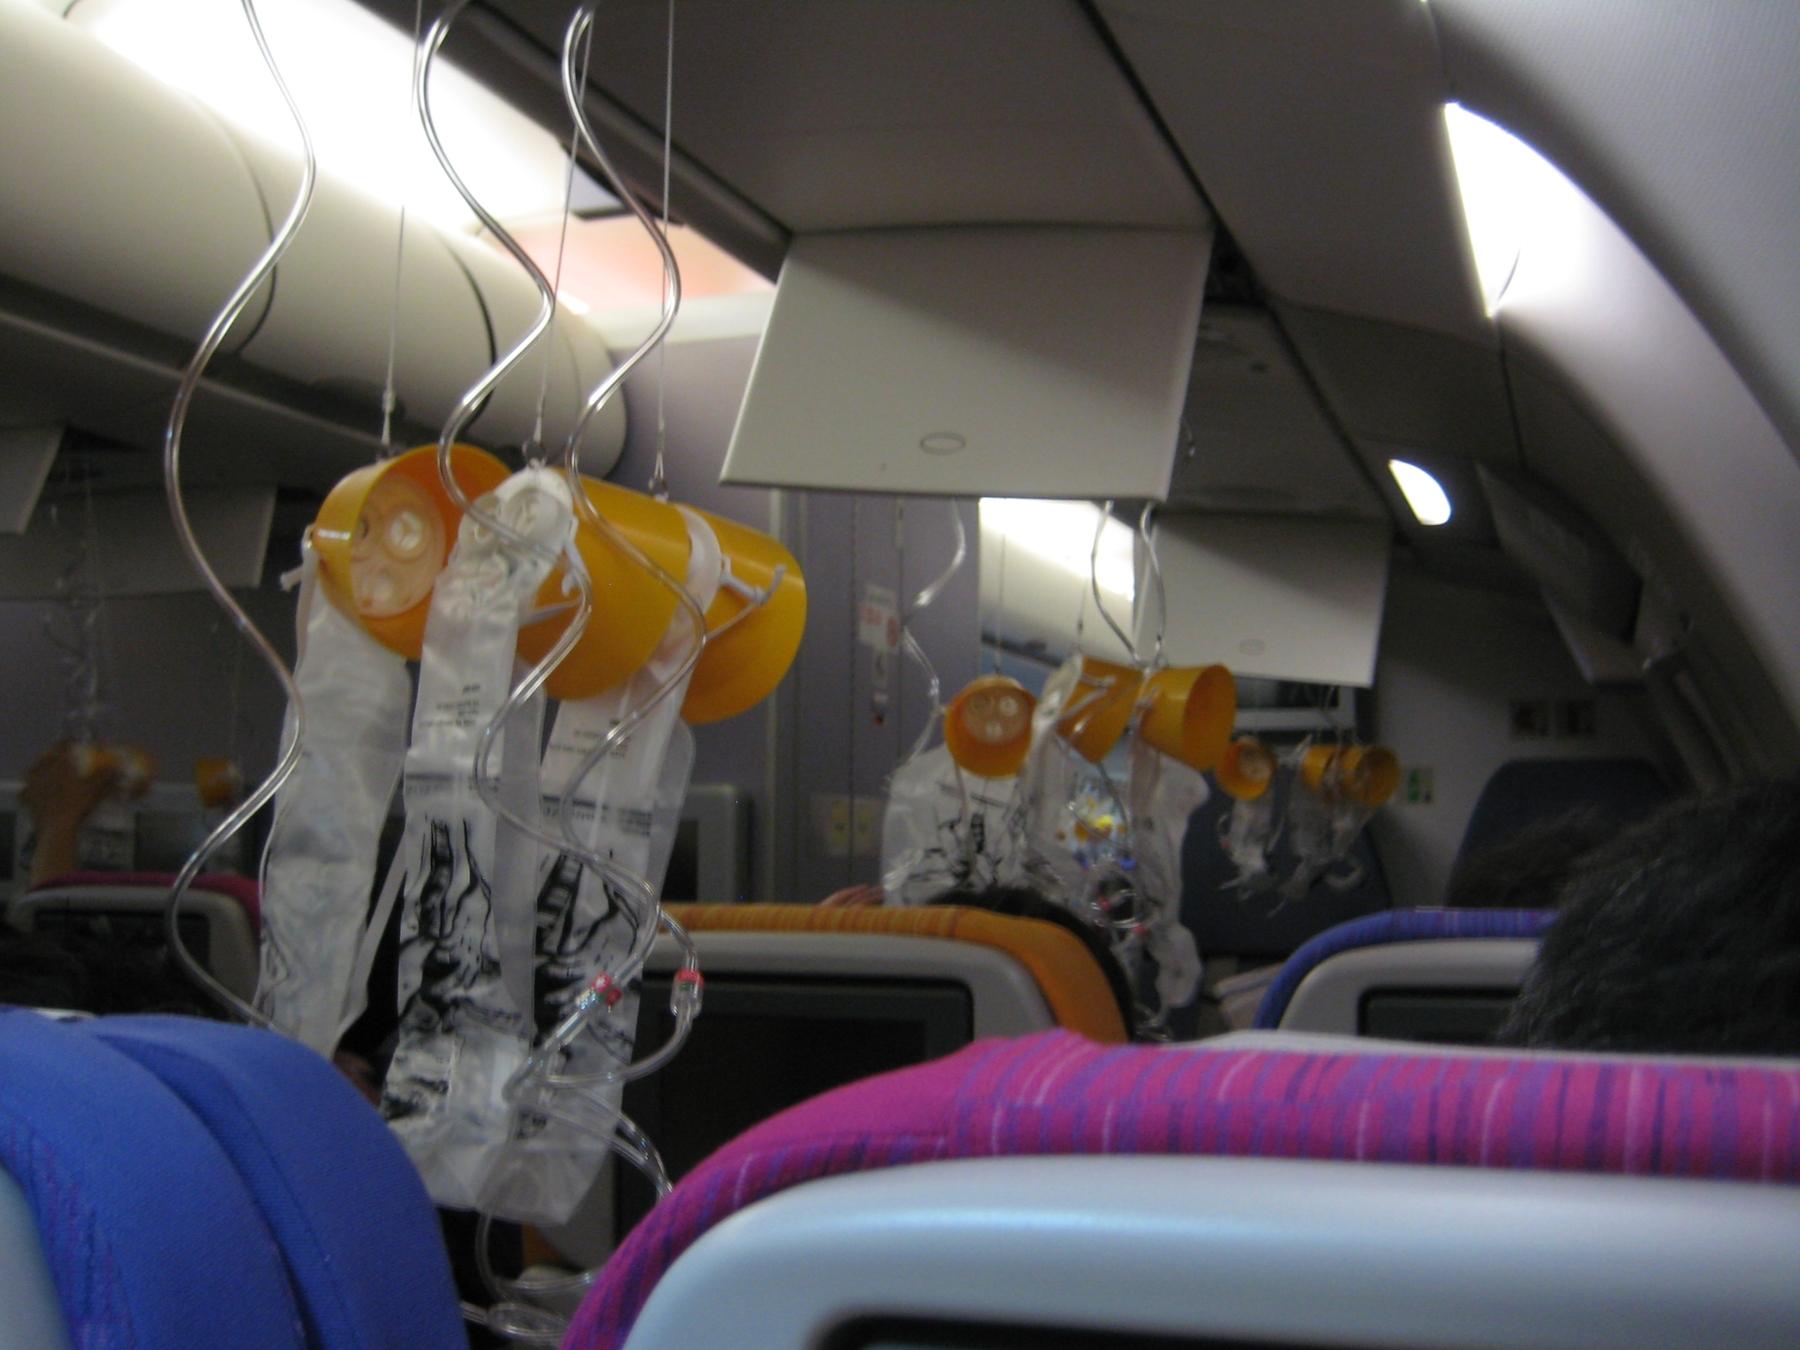 Maski tlenowe w samolocie